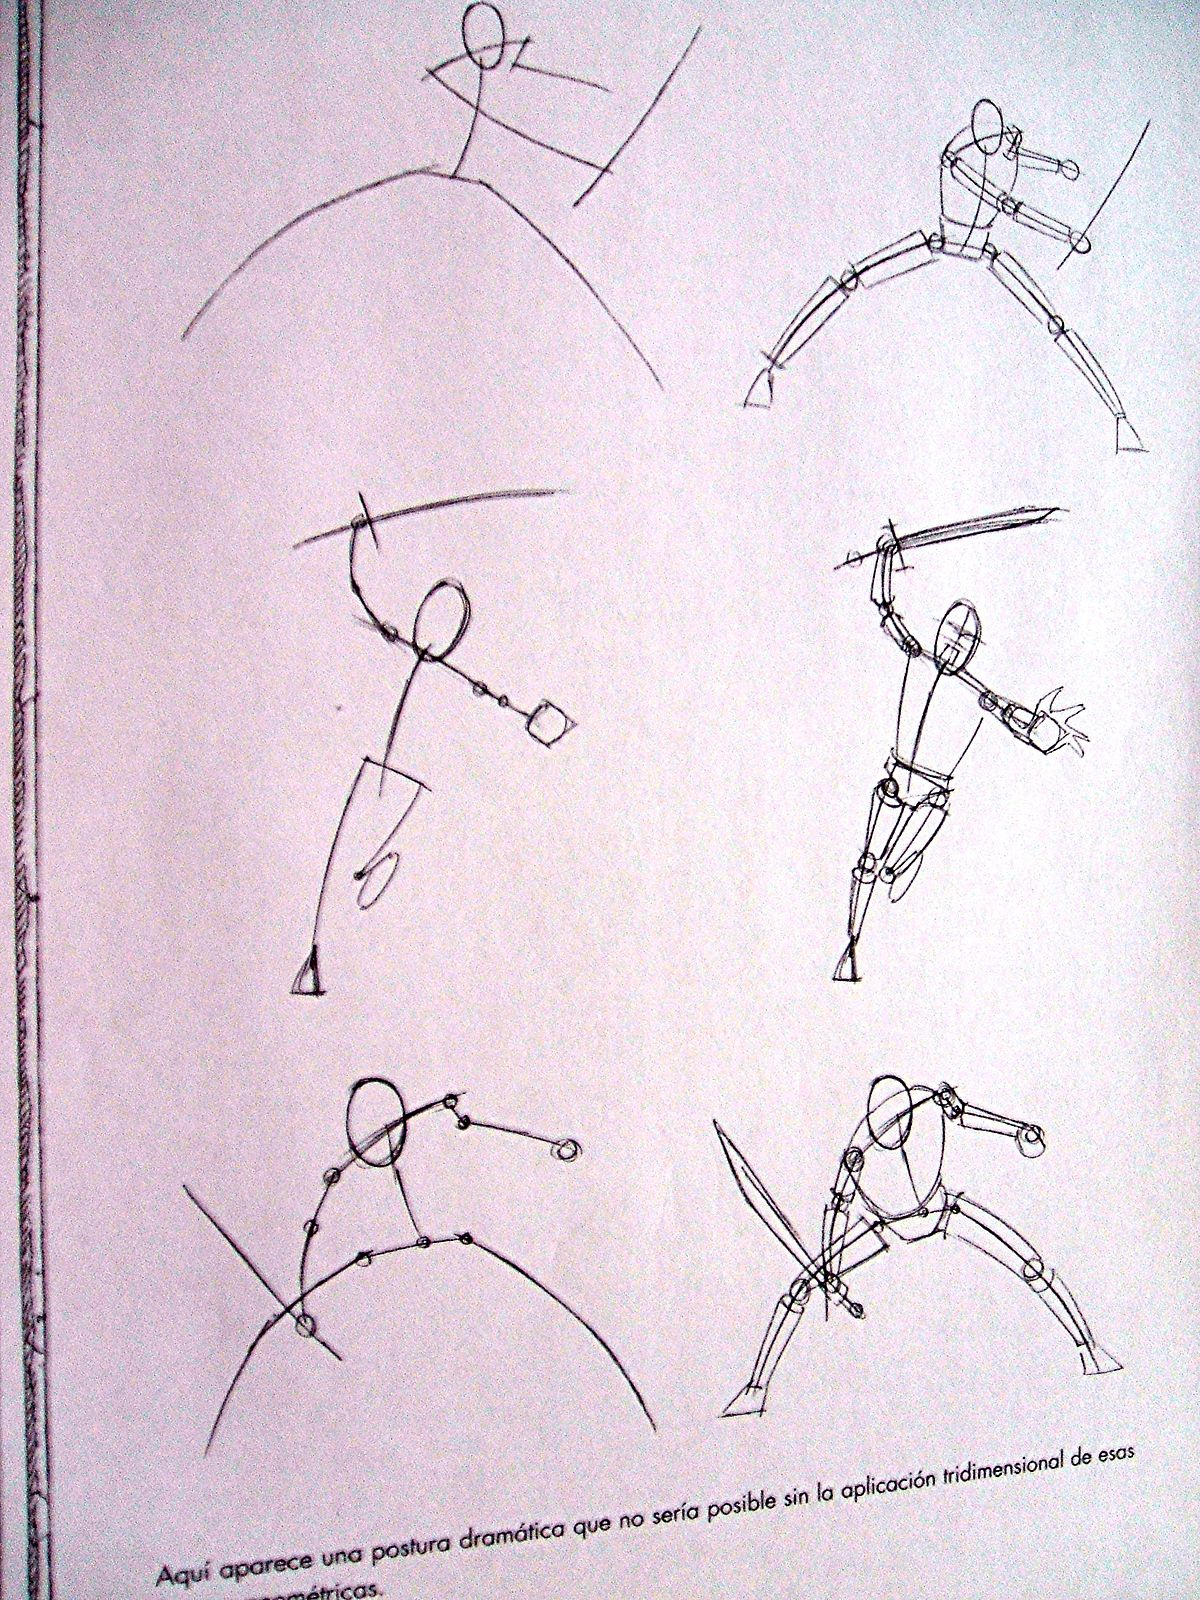 Esquema corporal - Wikipedia, la enciclopedia libre